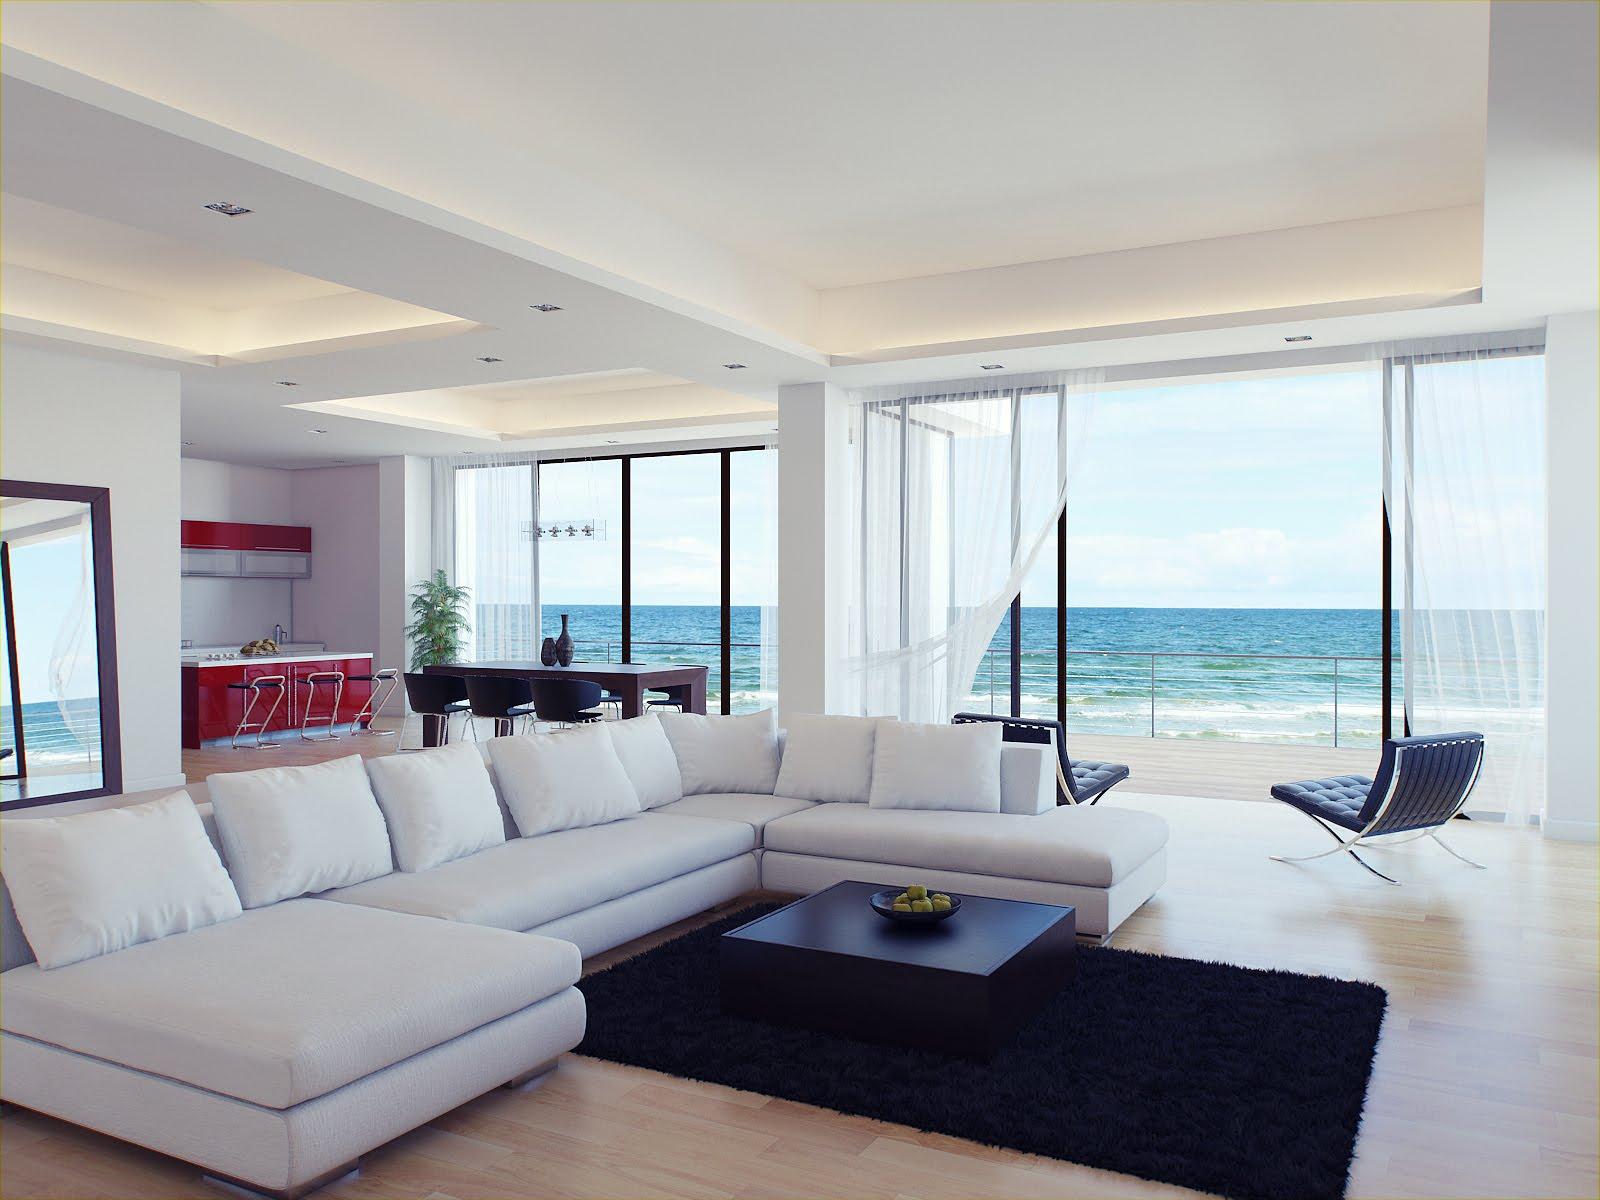 Купить квартиру за границей у моря недорого